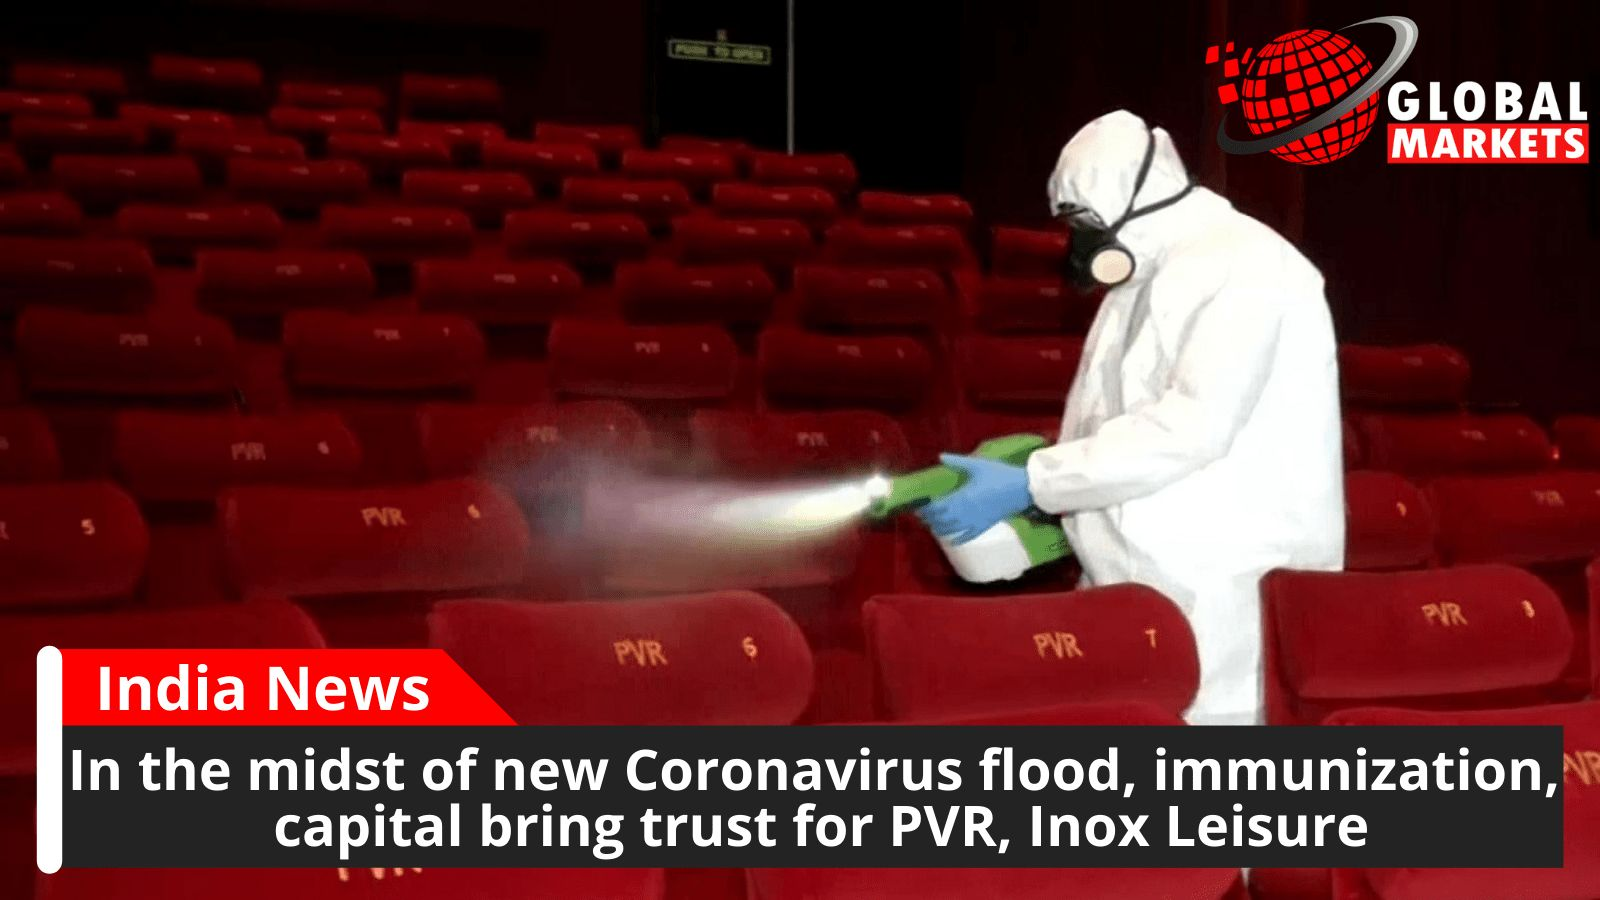 In the midst of new Coronavirus flood, immunization, capital bring trust for PVR, Inox Leisure